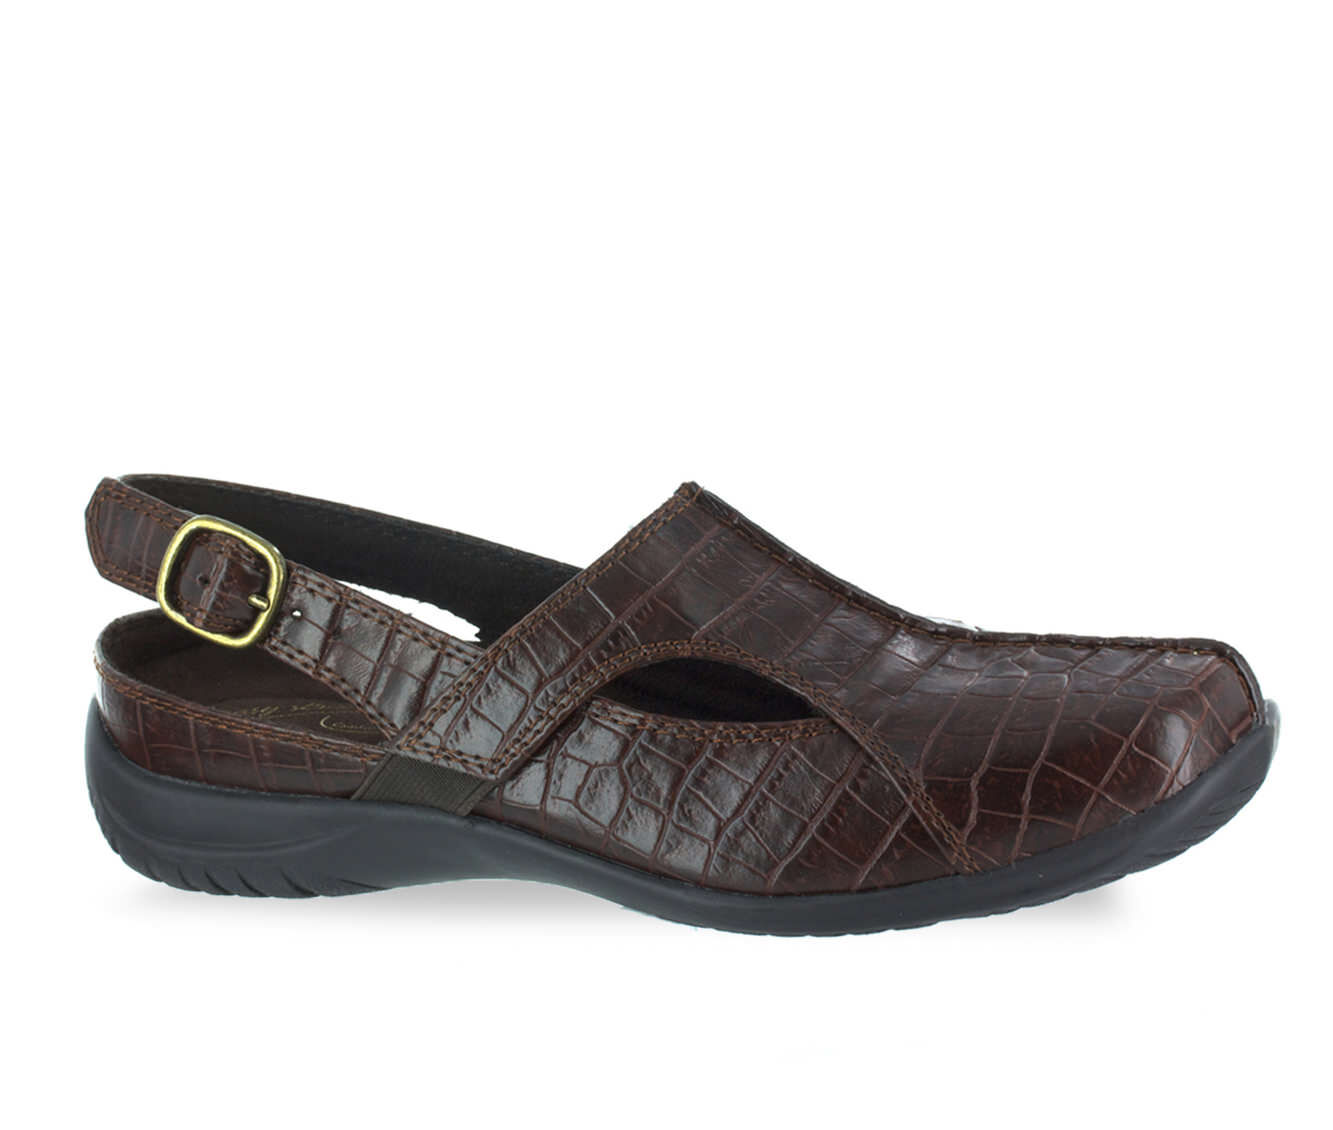 Women's Easy Street Sportser Shoes Brown Croco